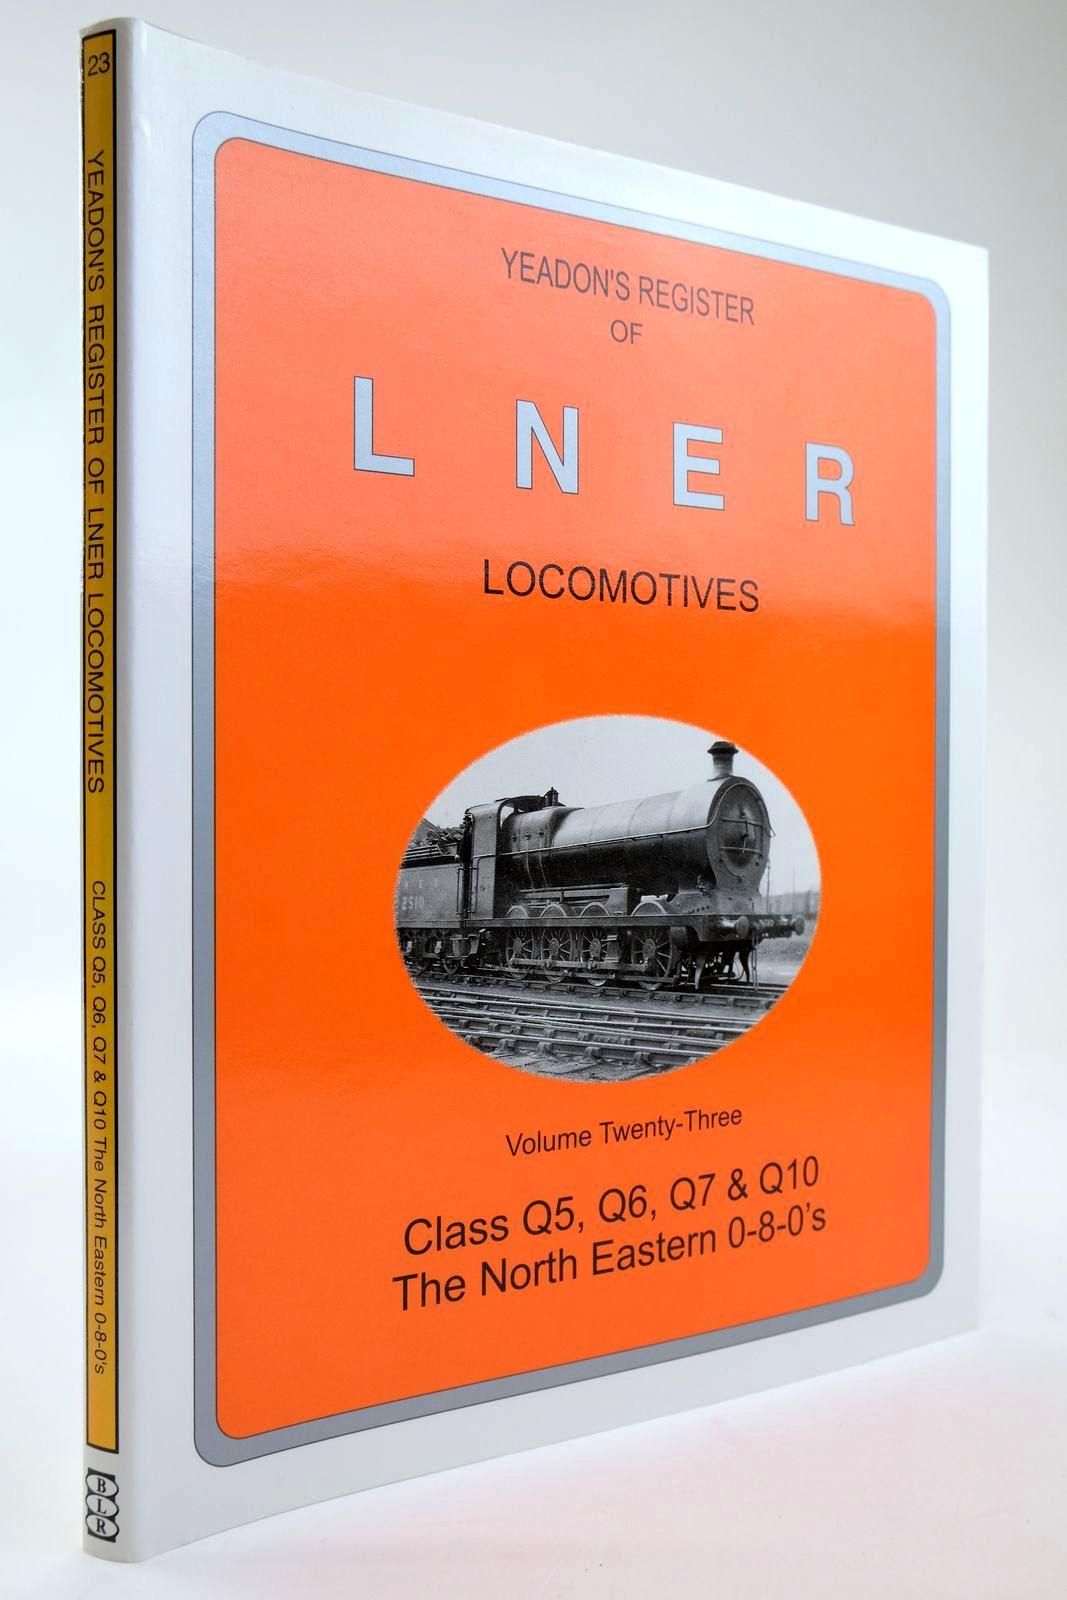 Photo of YEADON'S REGISTER OF LNER LOCOMOTIVES VOLUME TWENTY-THREE- Stock Number: 2133572